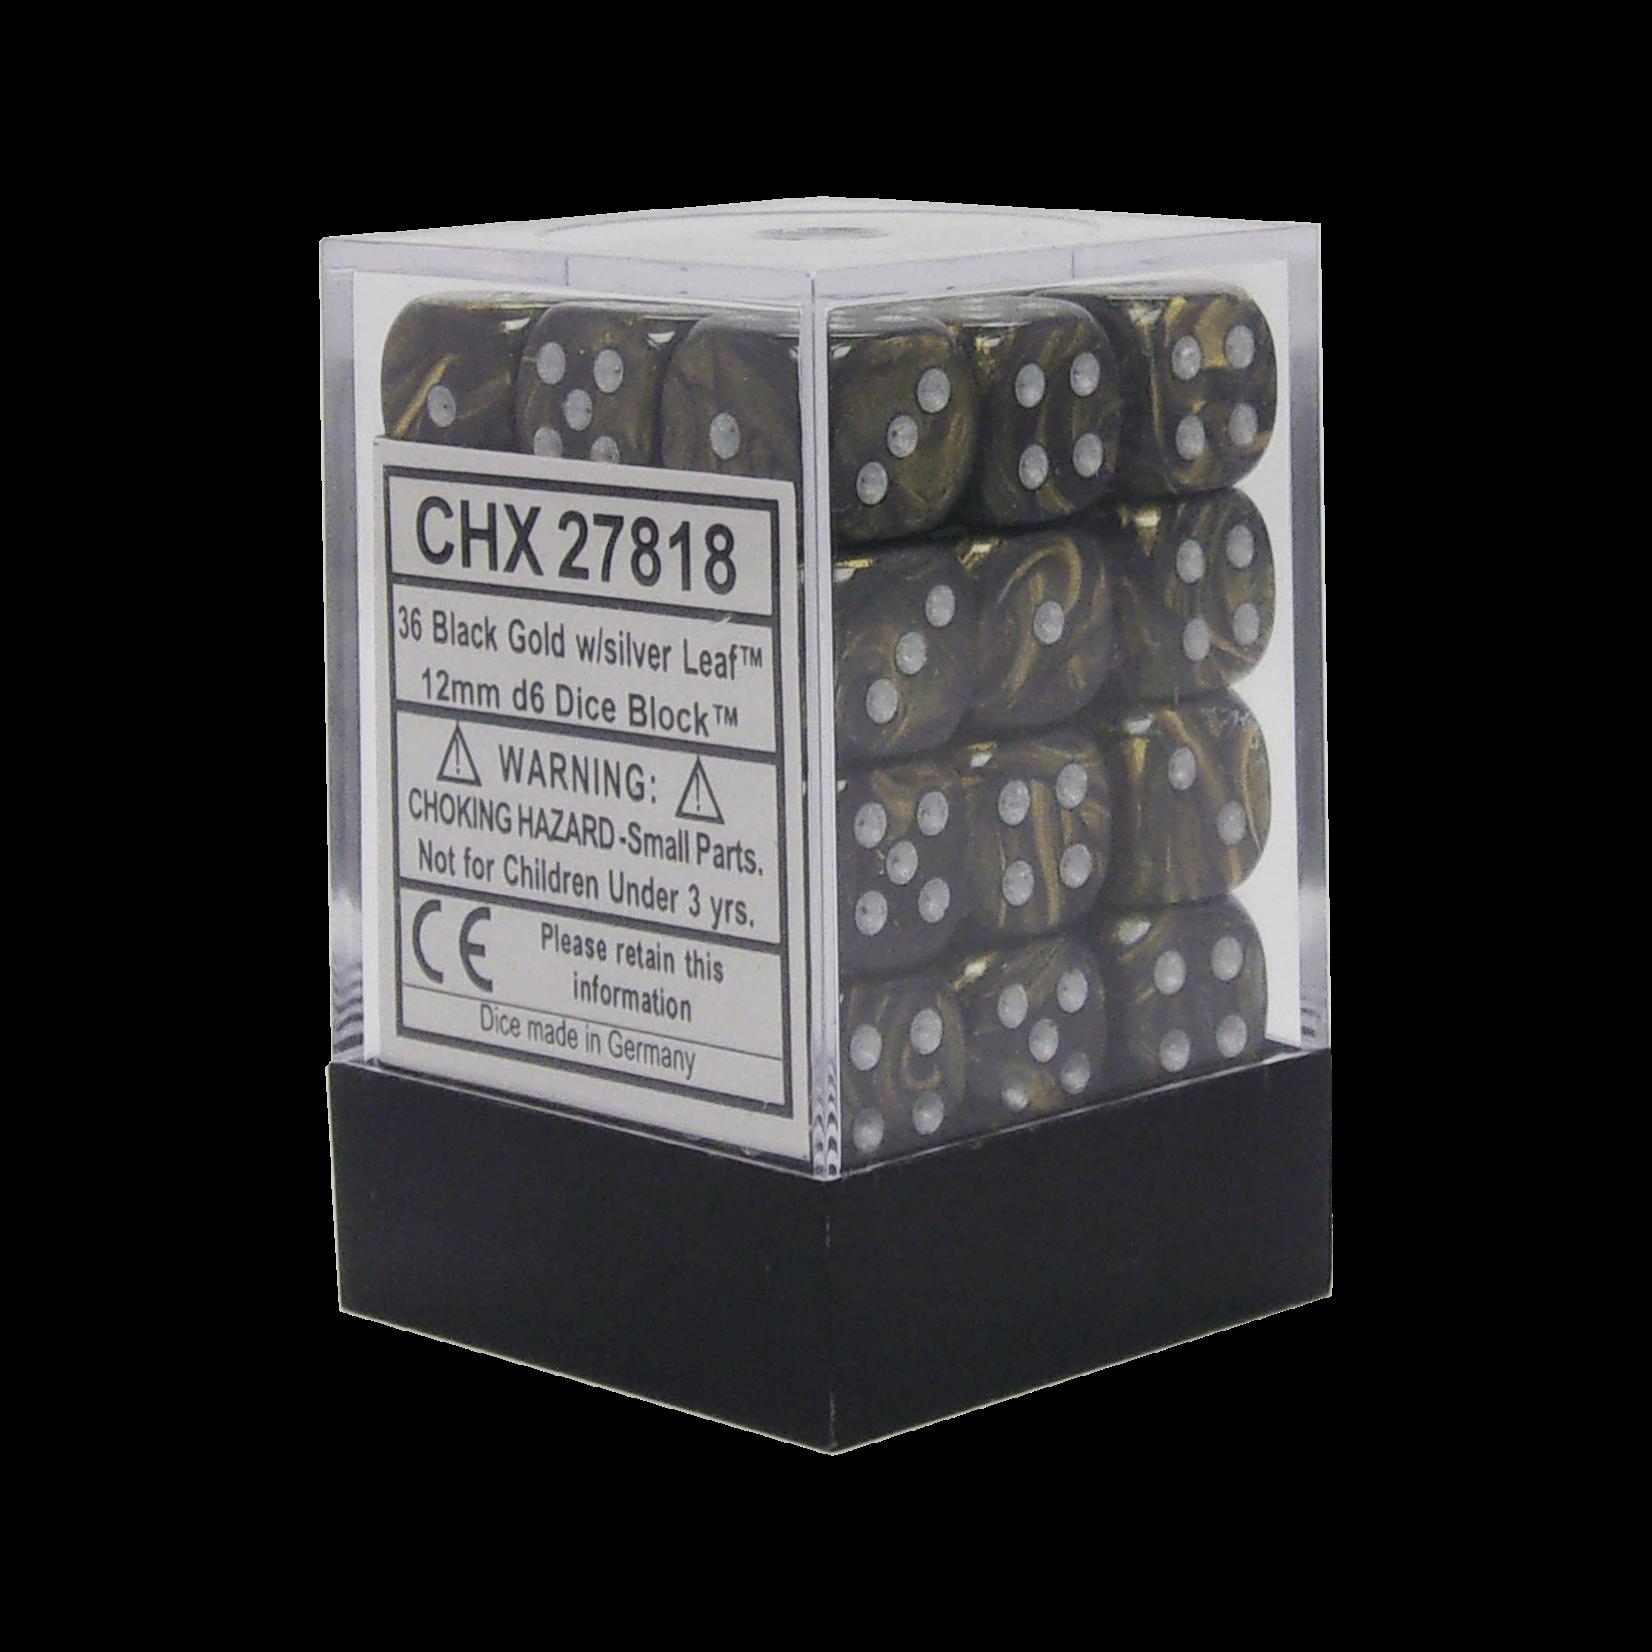 CHX 27818 Leaf Black Gold/Silver (36 count)